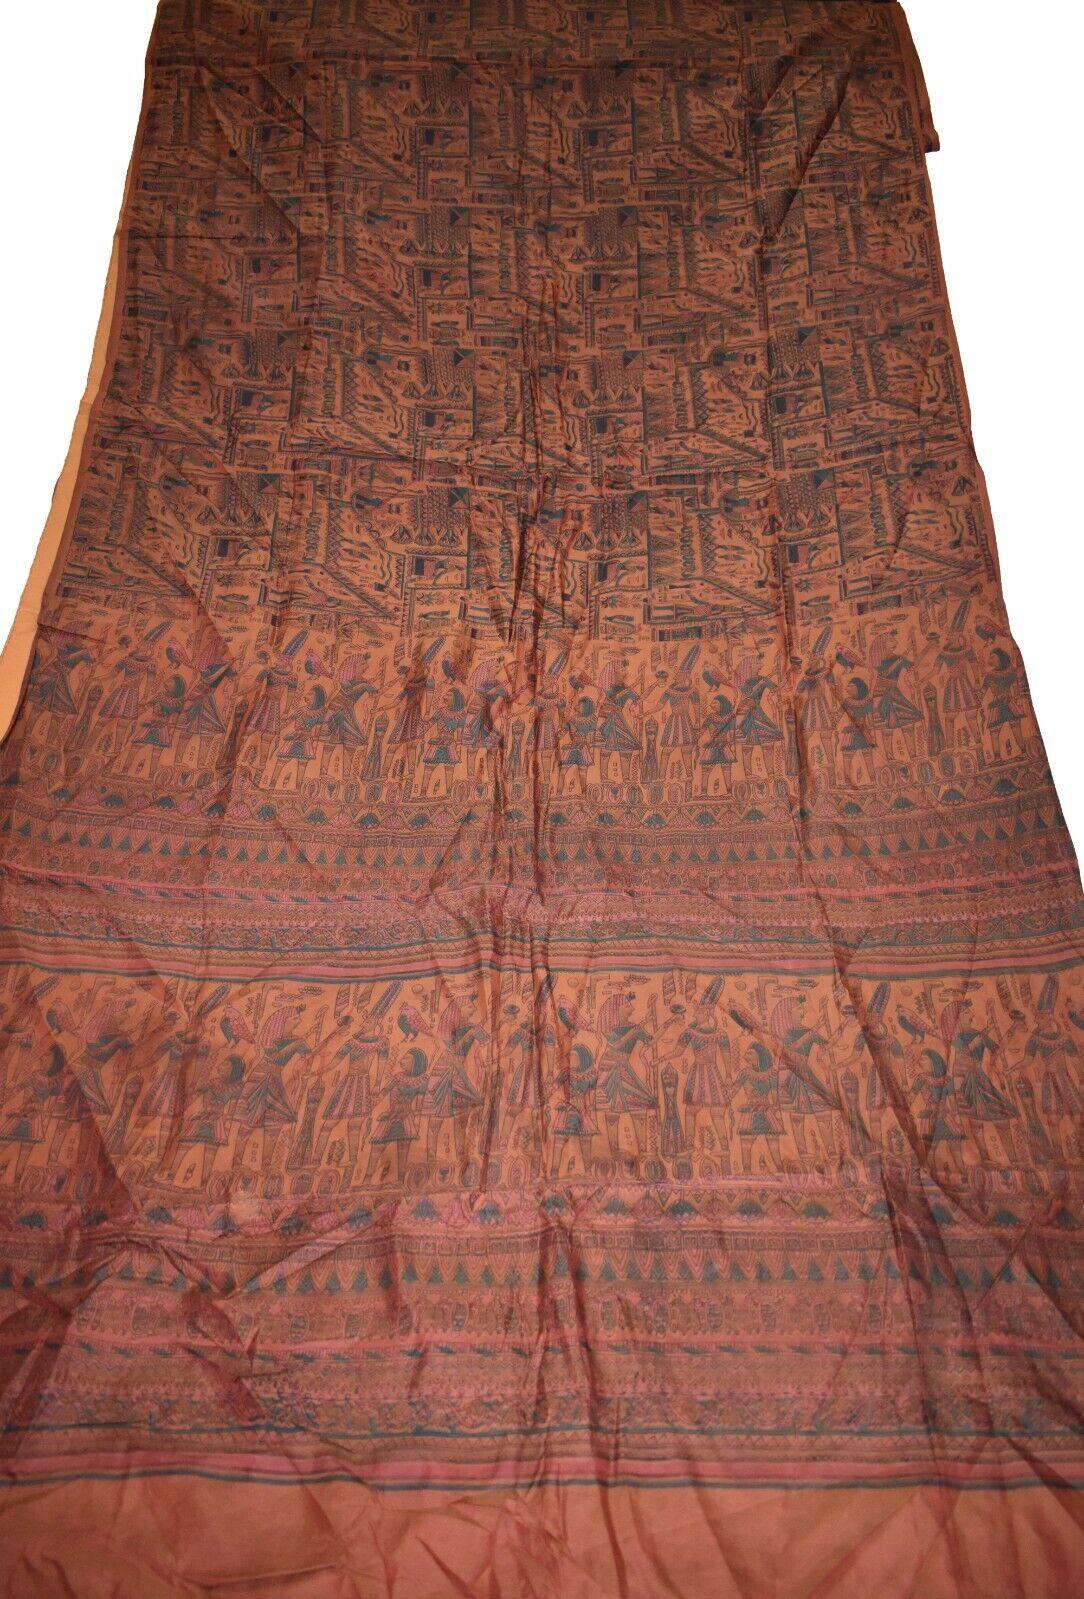 Vintage Printed Sari Brown Pure Silk Mythological Print 5Yrd Saree Design Craft